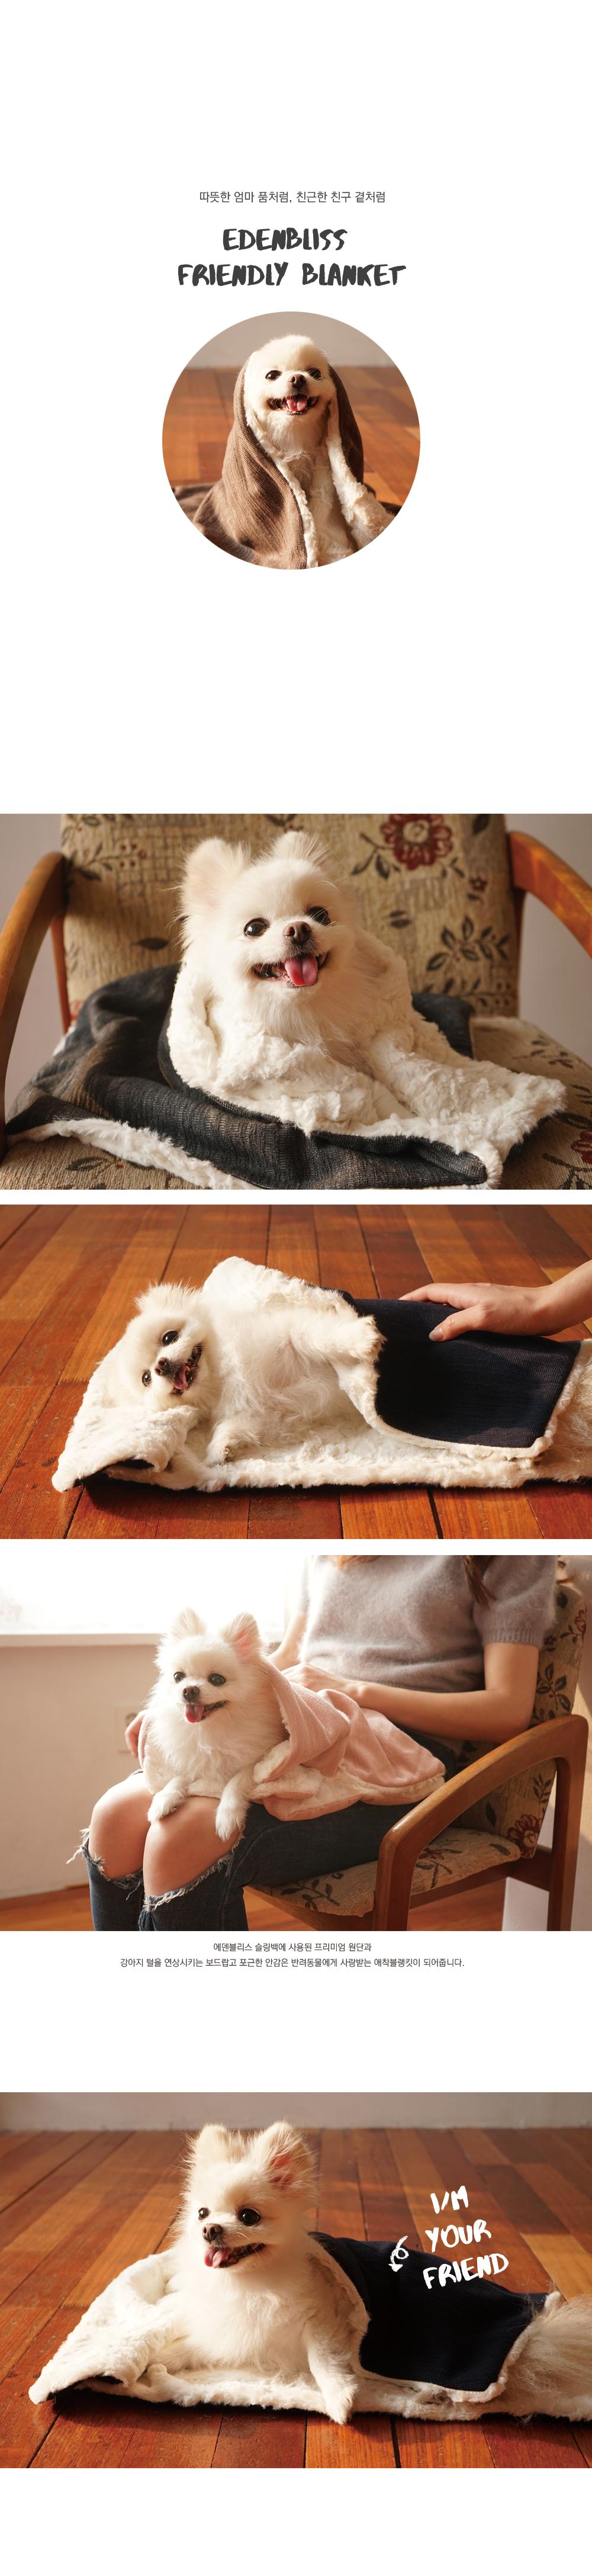 edenbliss 프렌들리 블랭킷 네이비-강아지 고양이 담요 이불 - 에덴블리스, 37,000원, 하우스/식기/실내용품, 방석/매트